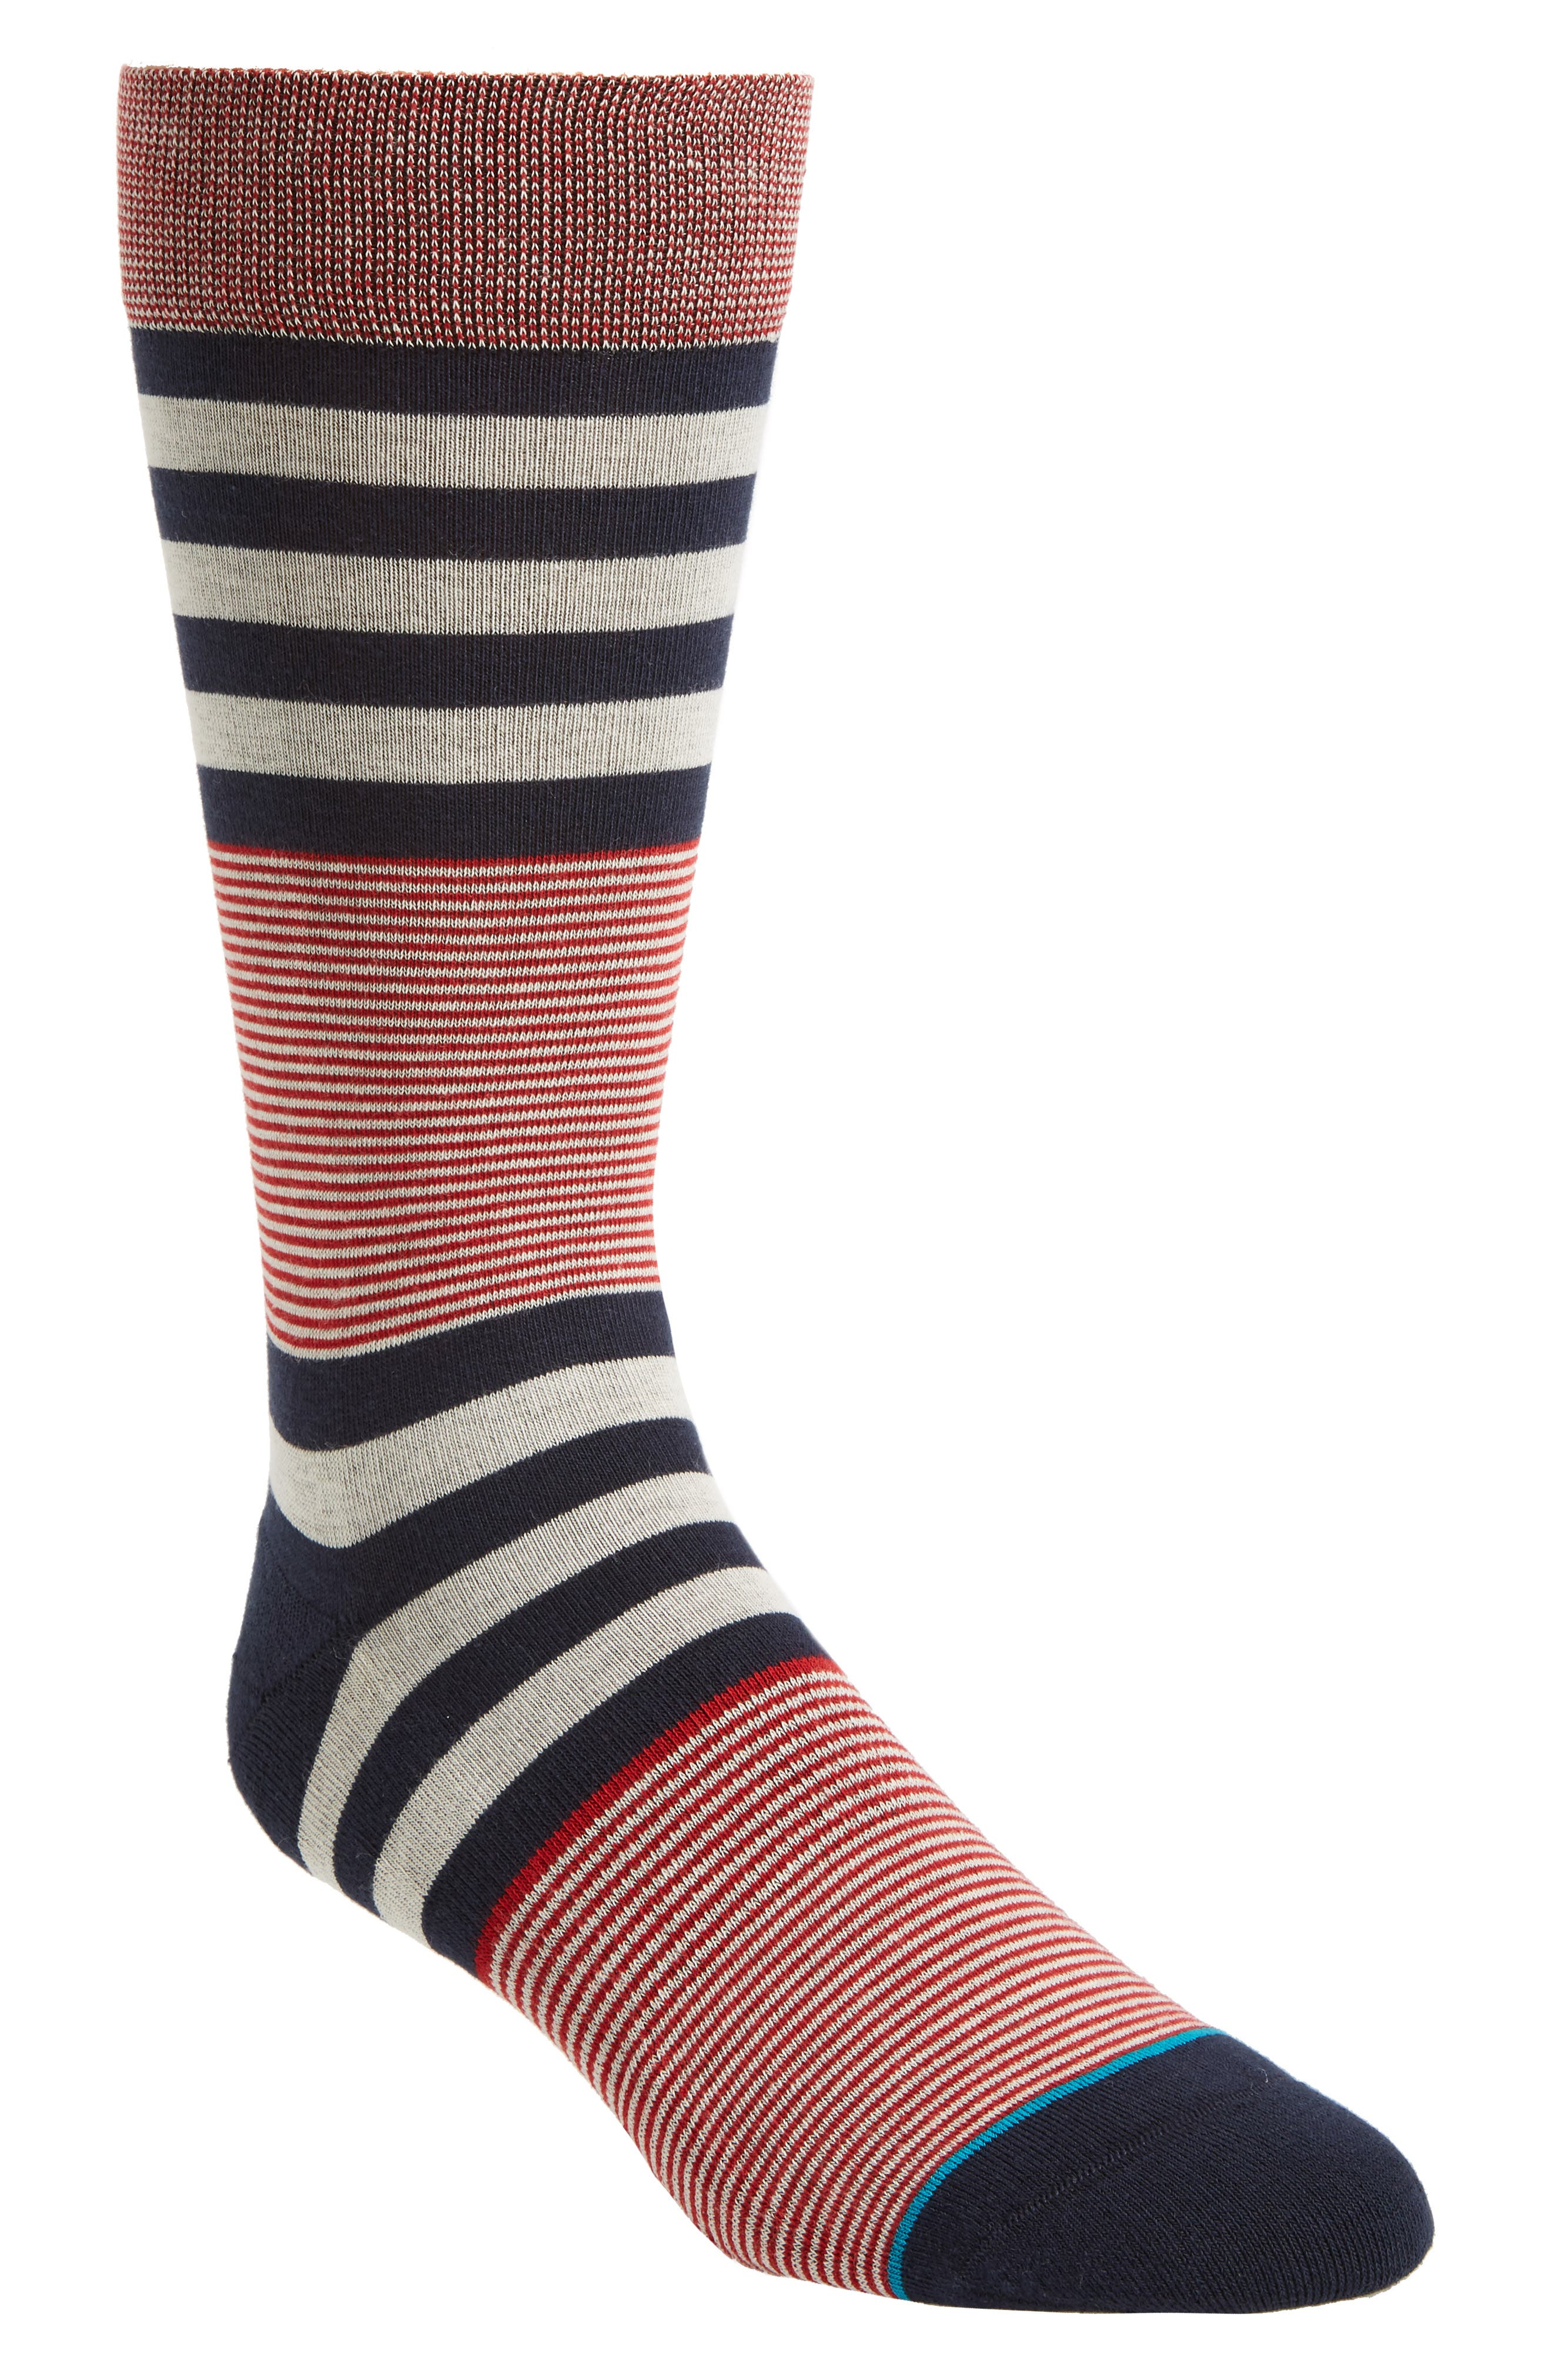 Main Image - Stance Americanas Socks